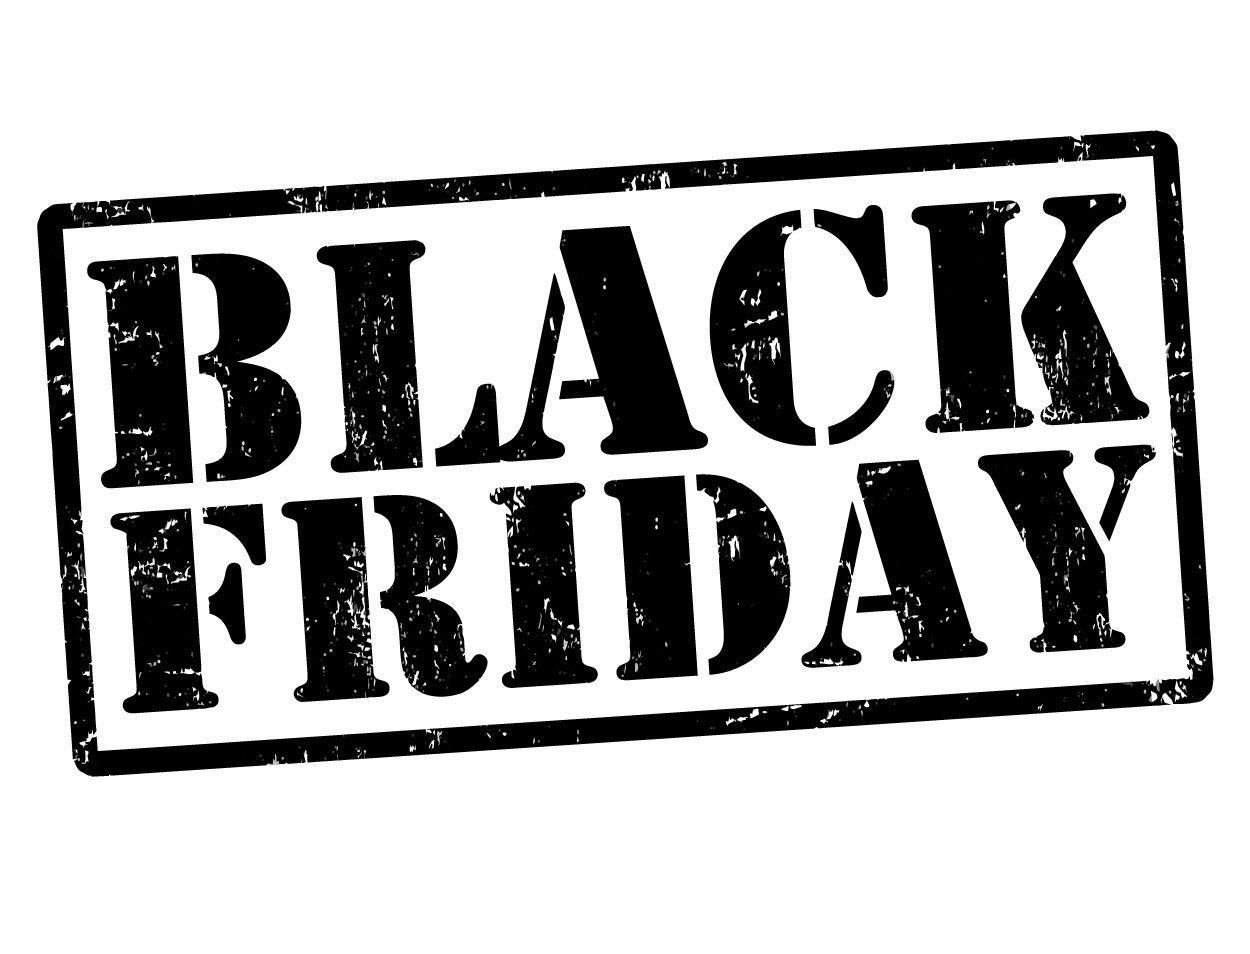 Black Friday: A Documentary